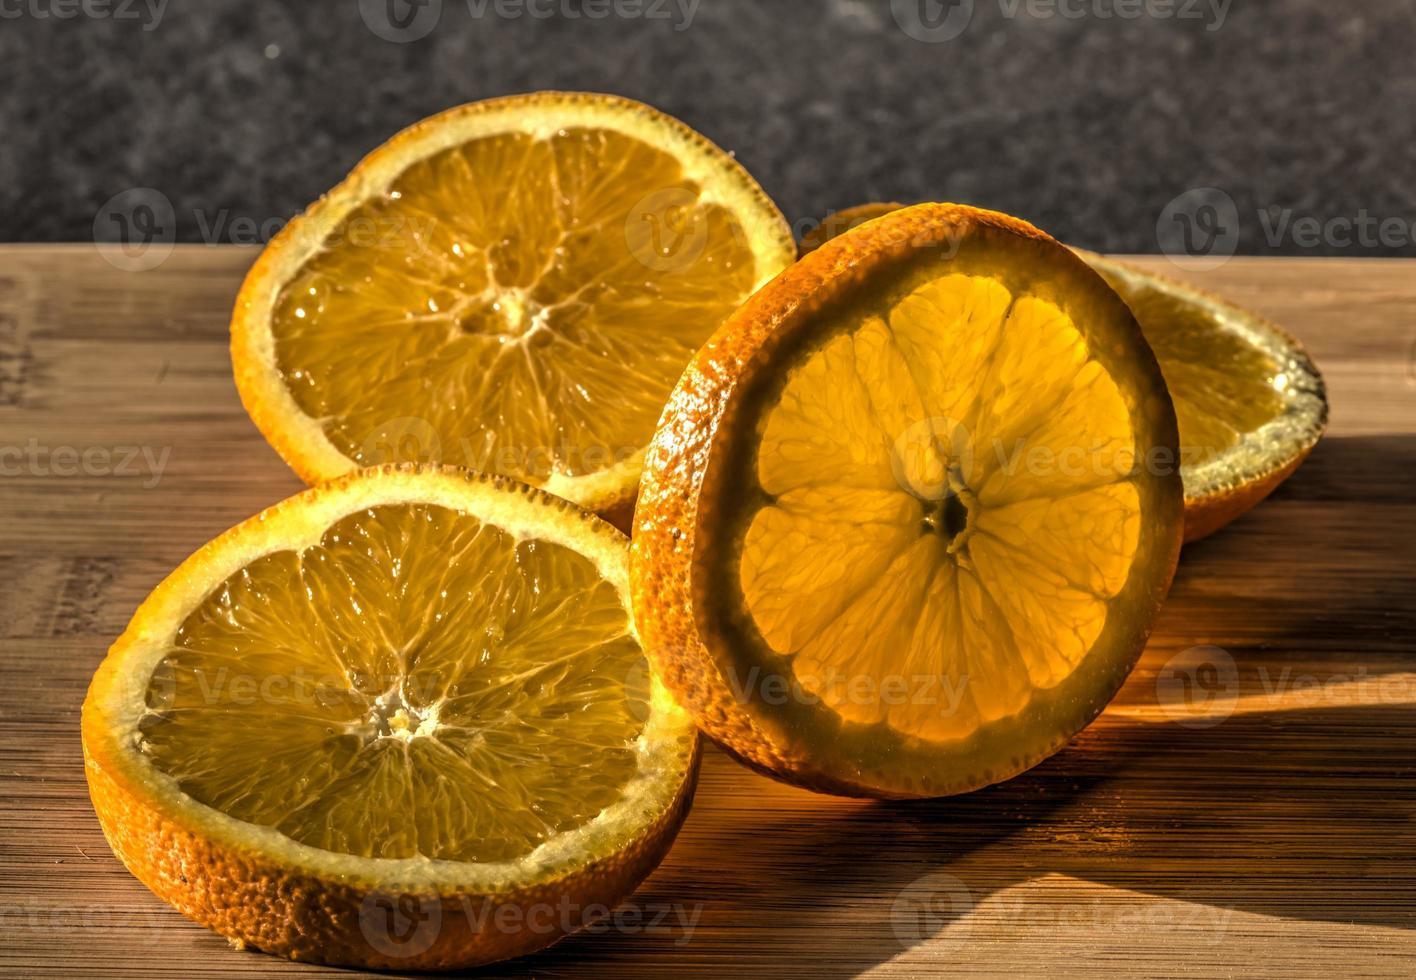 Sliced oranges photo